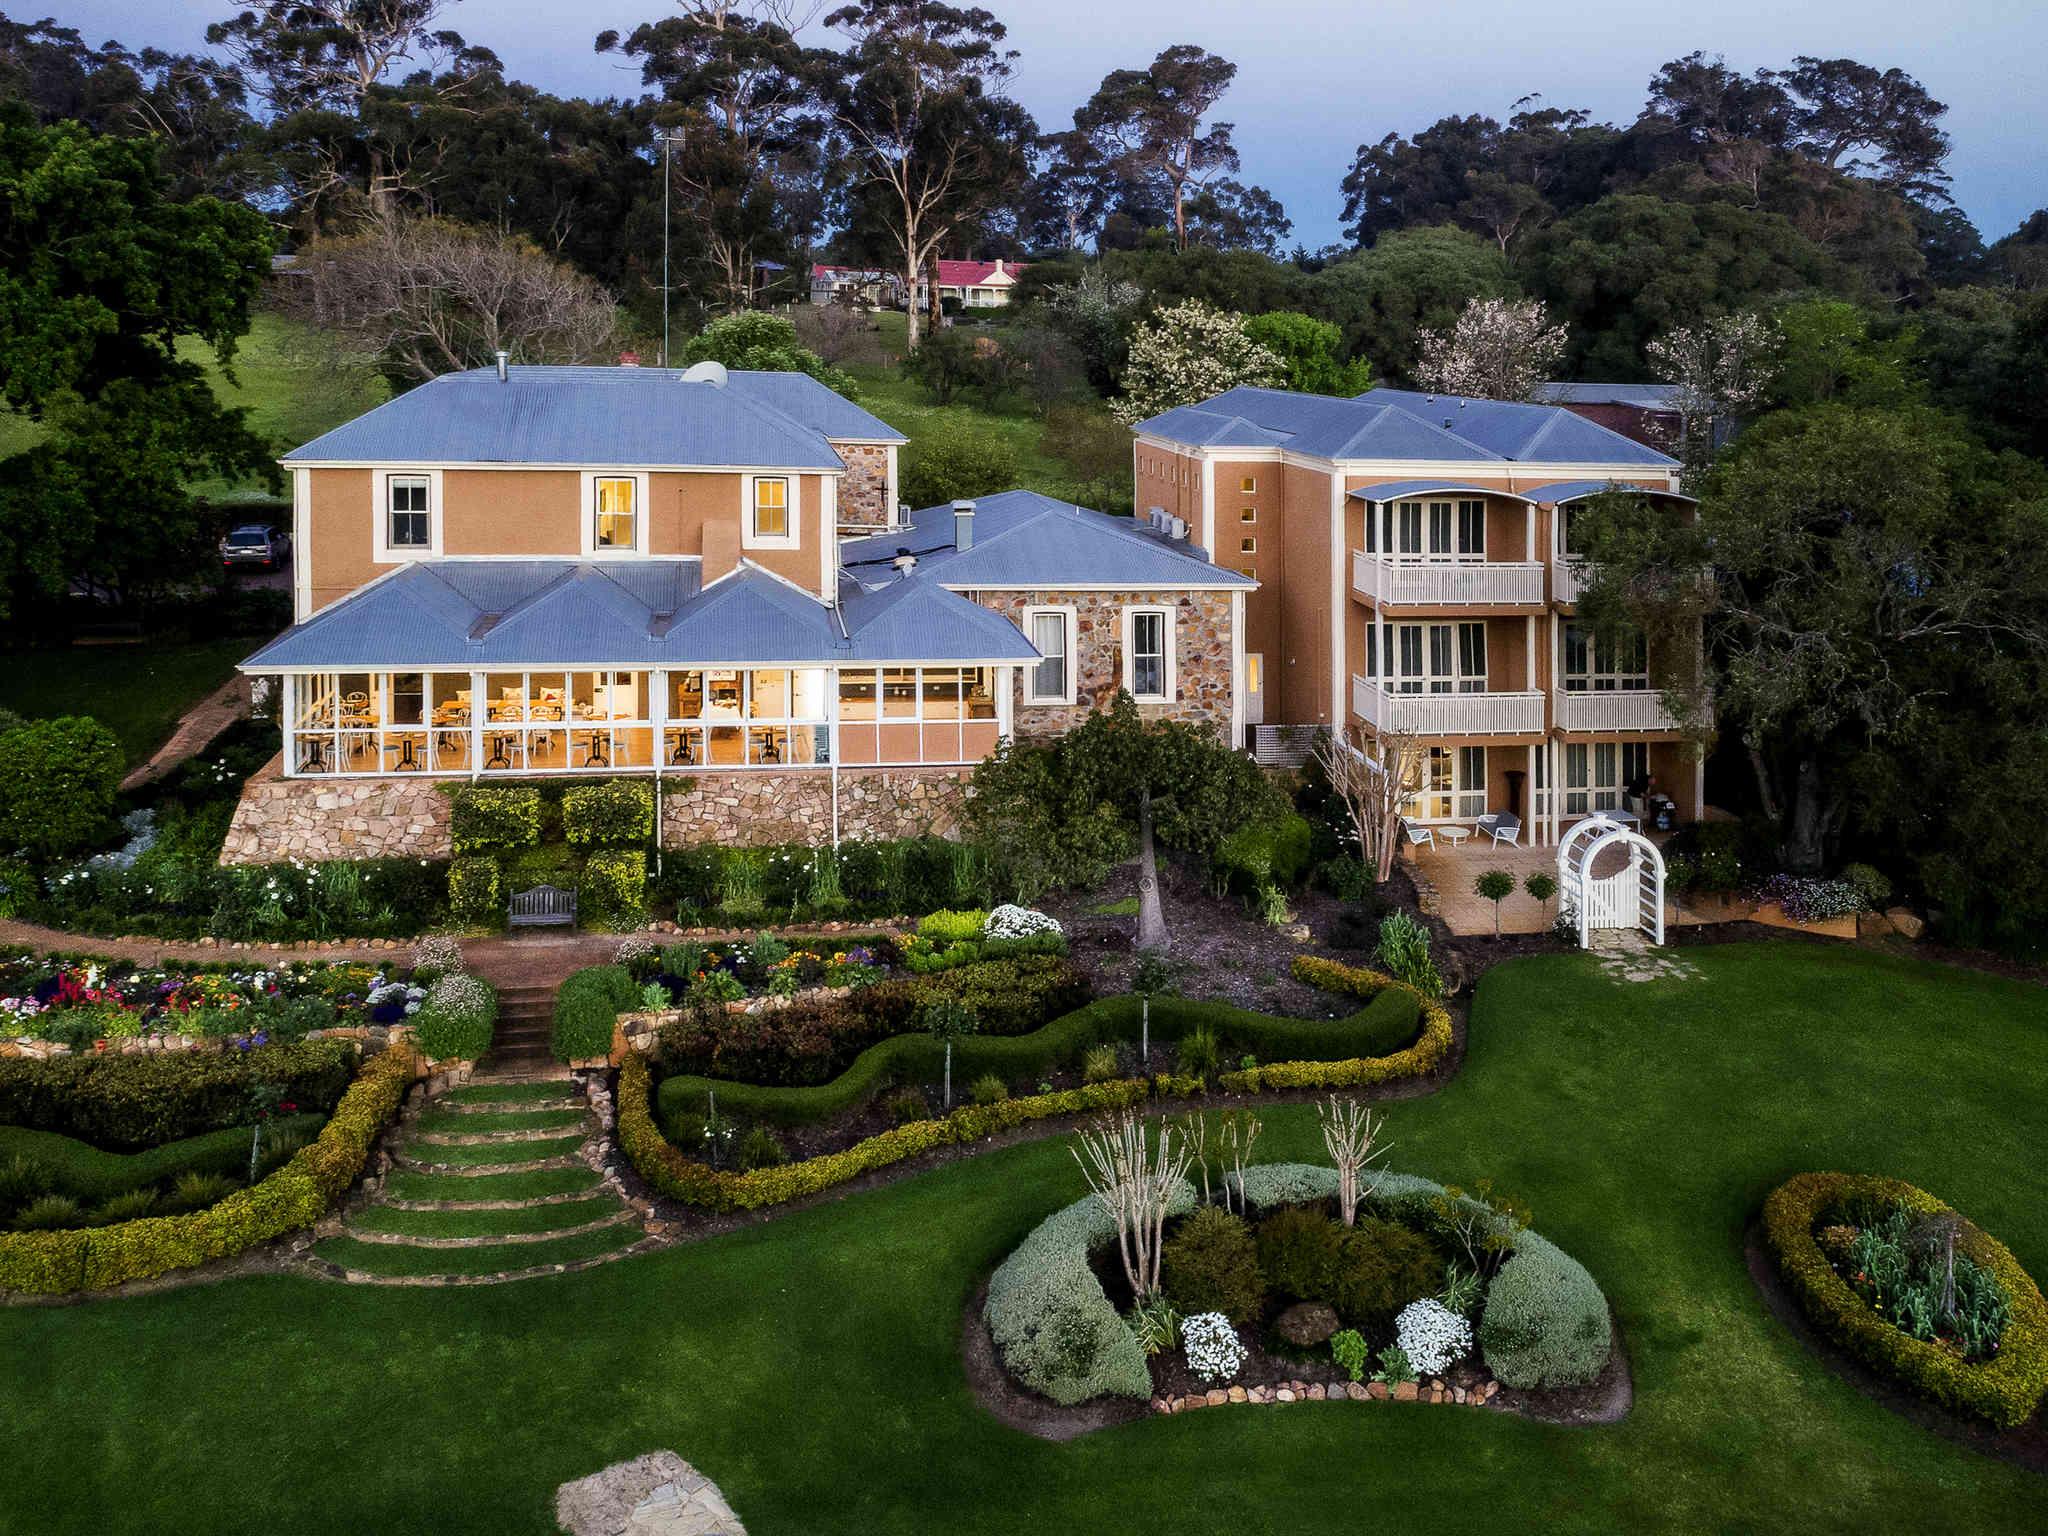 Отель — Grand Mercure Basildene Manor Accor Vacation Club Apartments